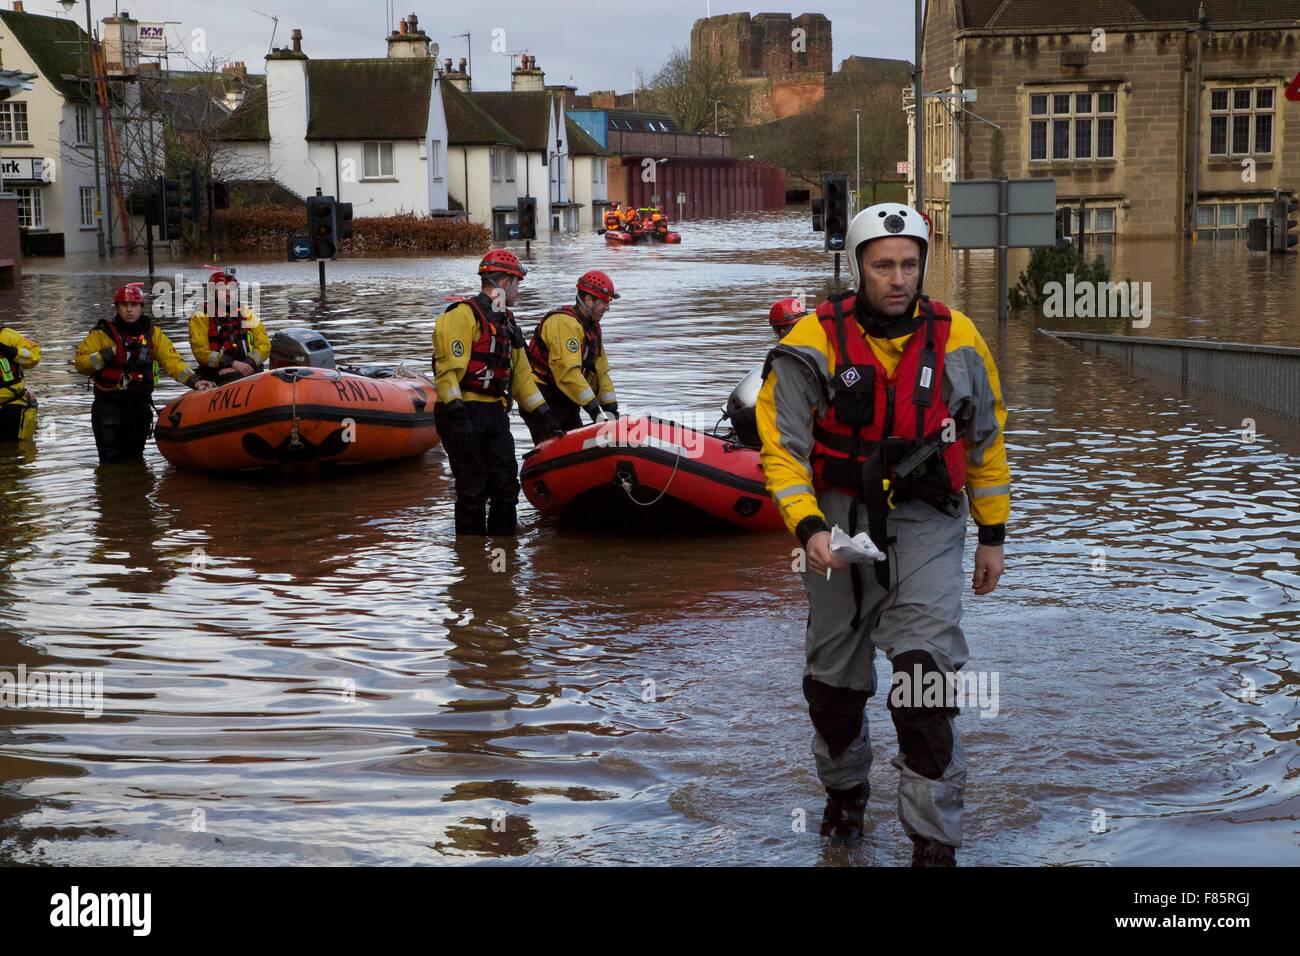 Cumbria Floods. 6th December 2015. RNLI rescue team volunteer wading through Carlisle city centre. Boats deployed - Stock Image